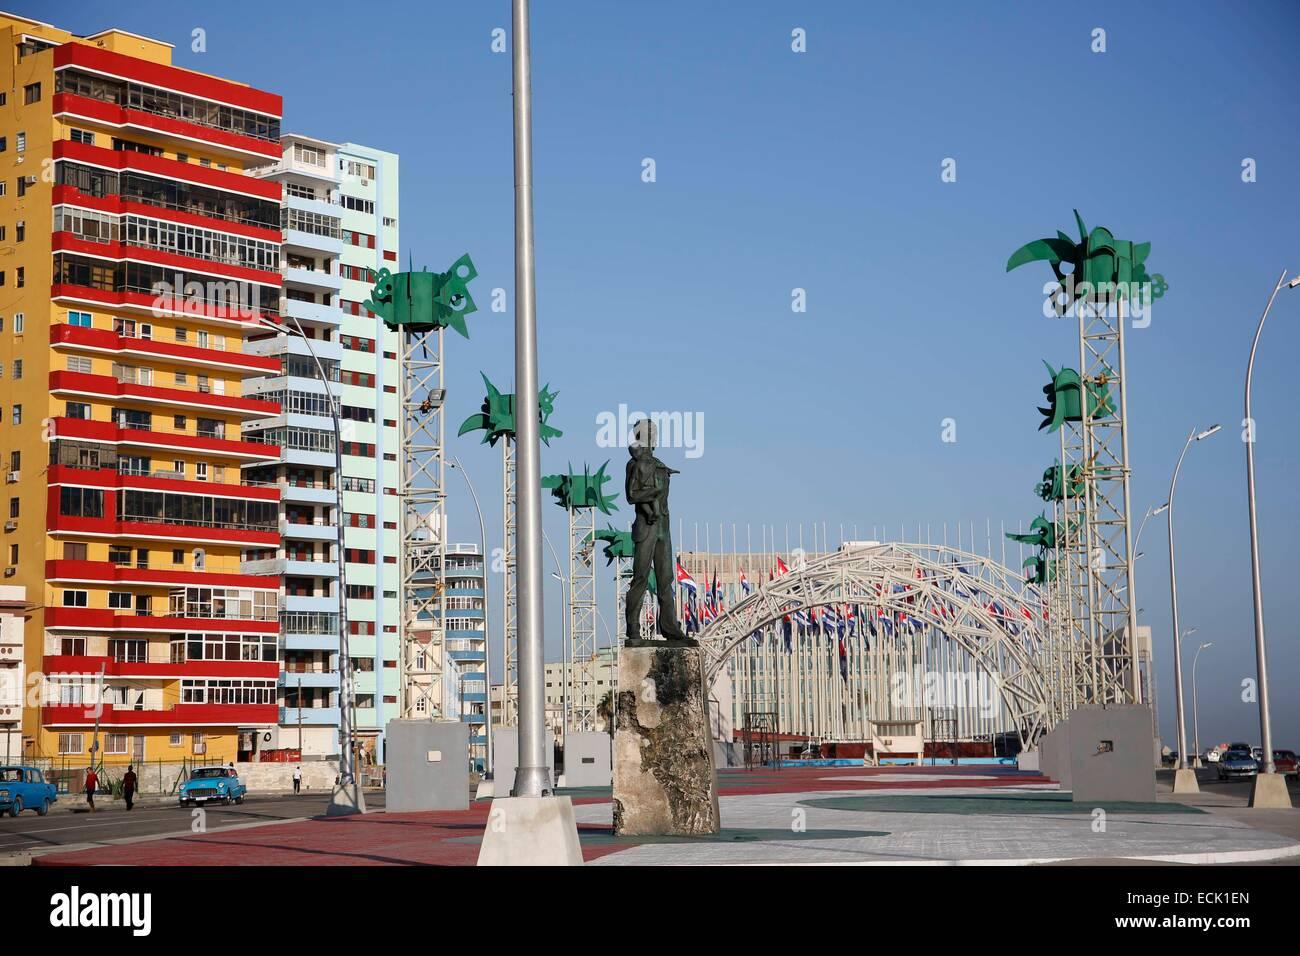 Cuba, La Havana, Maleco, wide boulevard along the sea - Stock Image